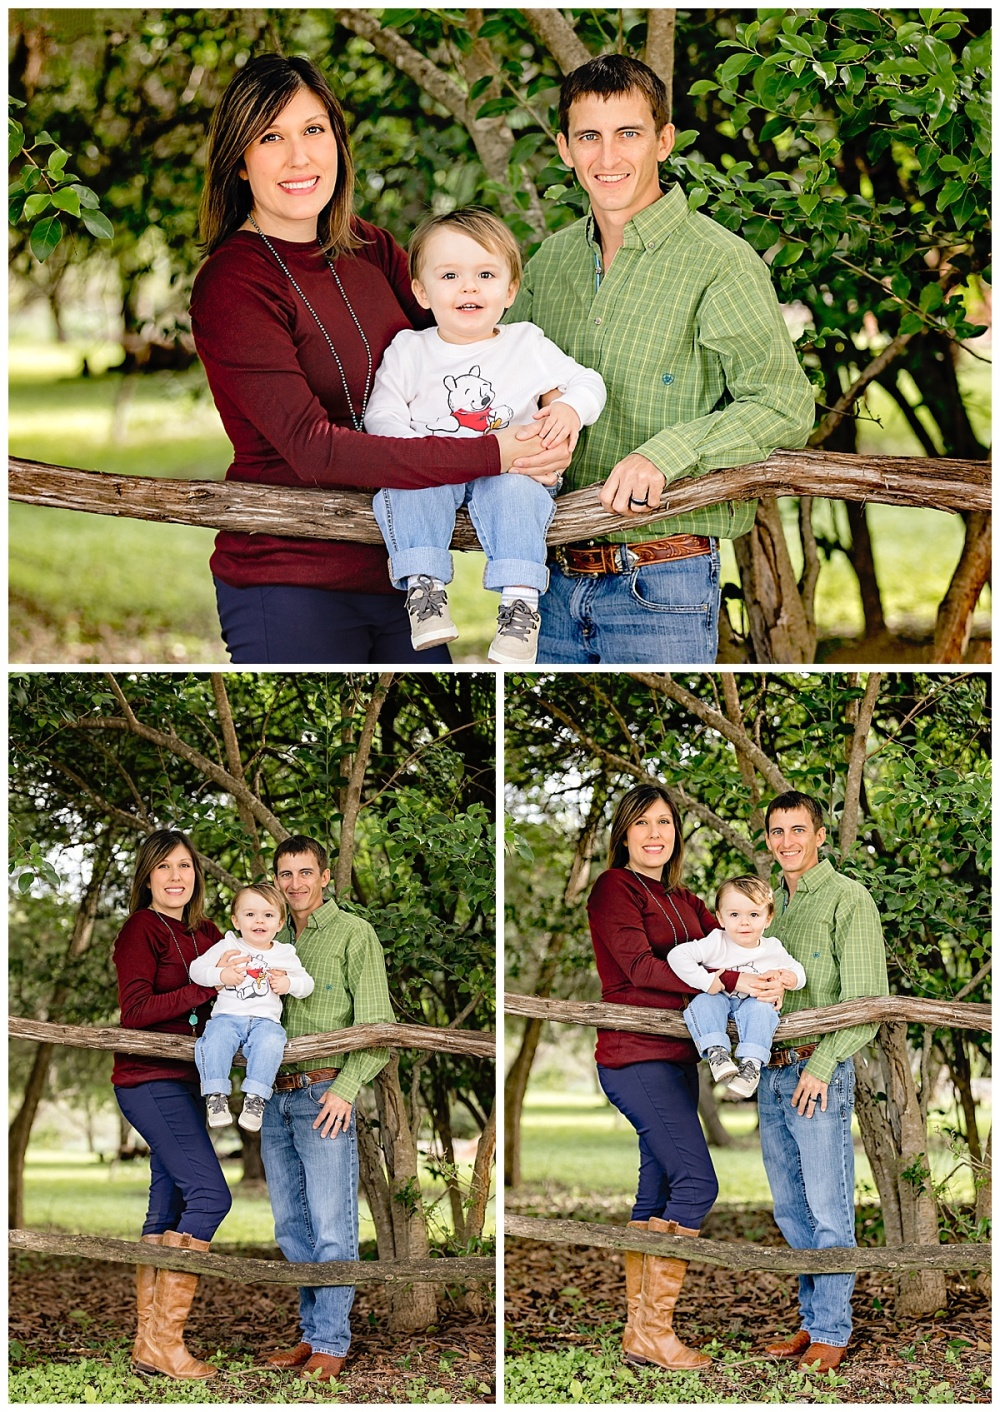 Family-Photographer-Gruene-Texas-Fall-Carly-Barton-Photography_0001.jpg